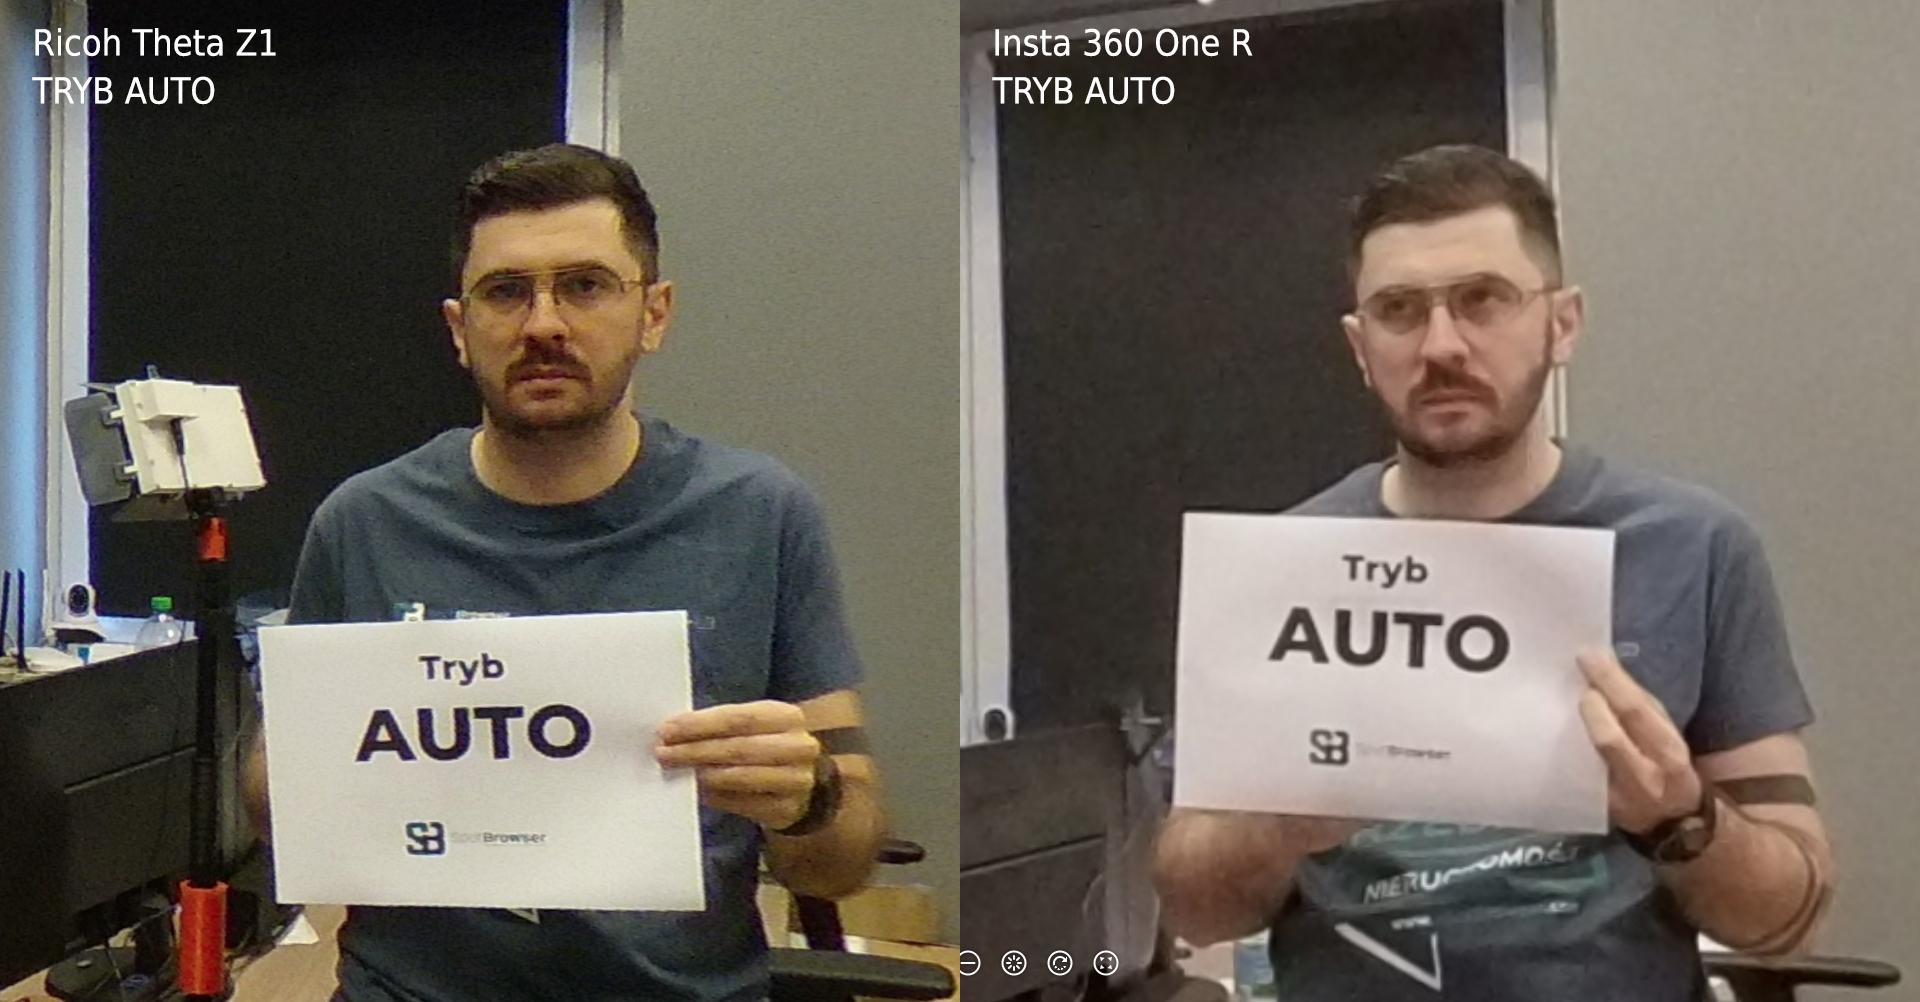 Ricoh Theta Z1 vs Insta 360 One R  tryb: Auto